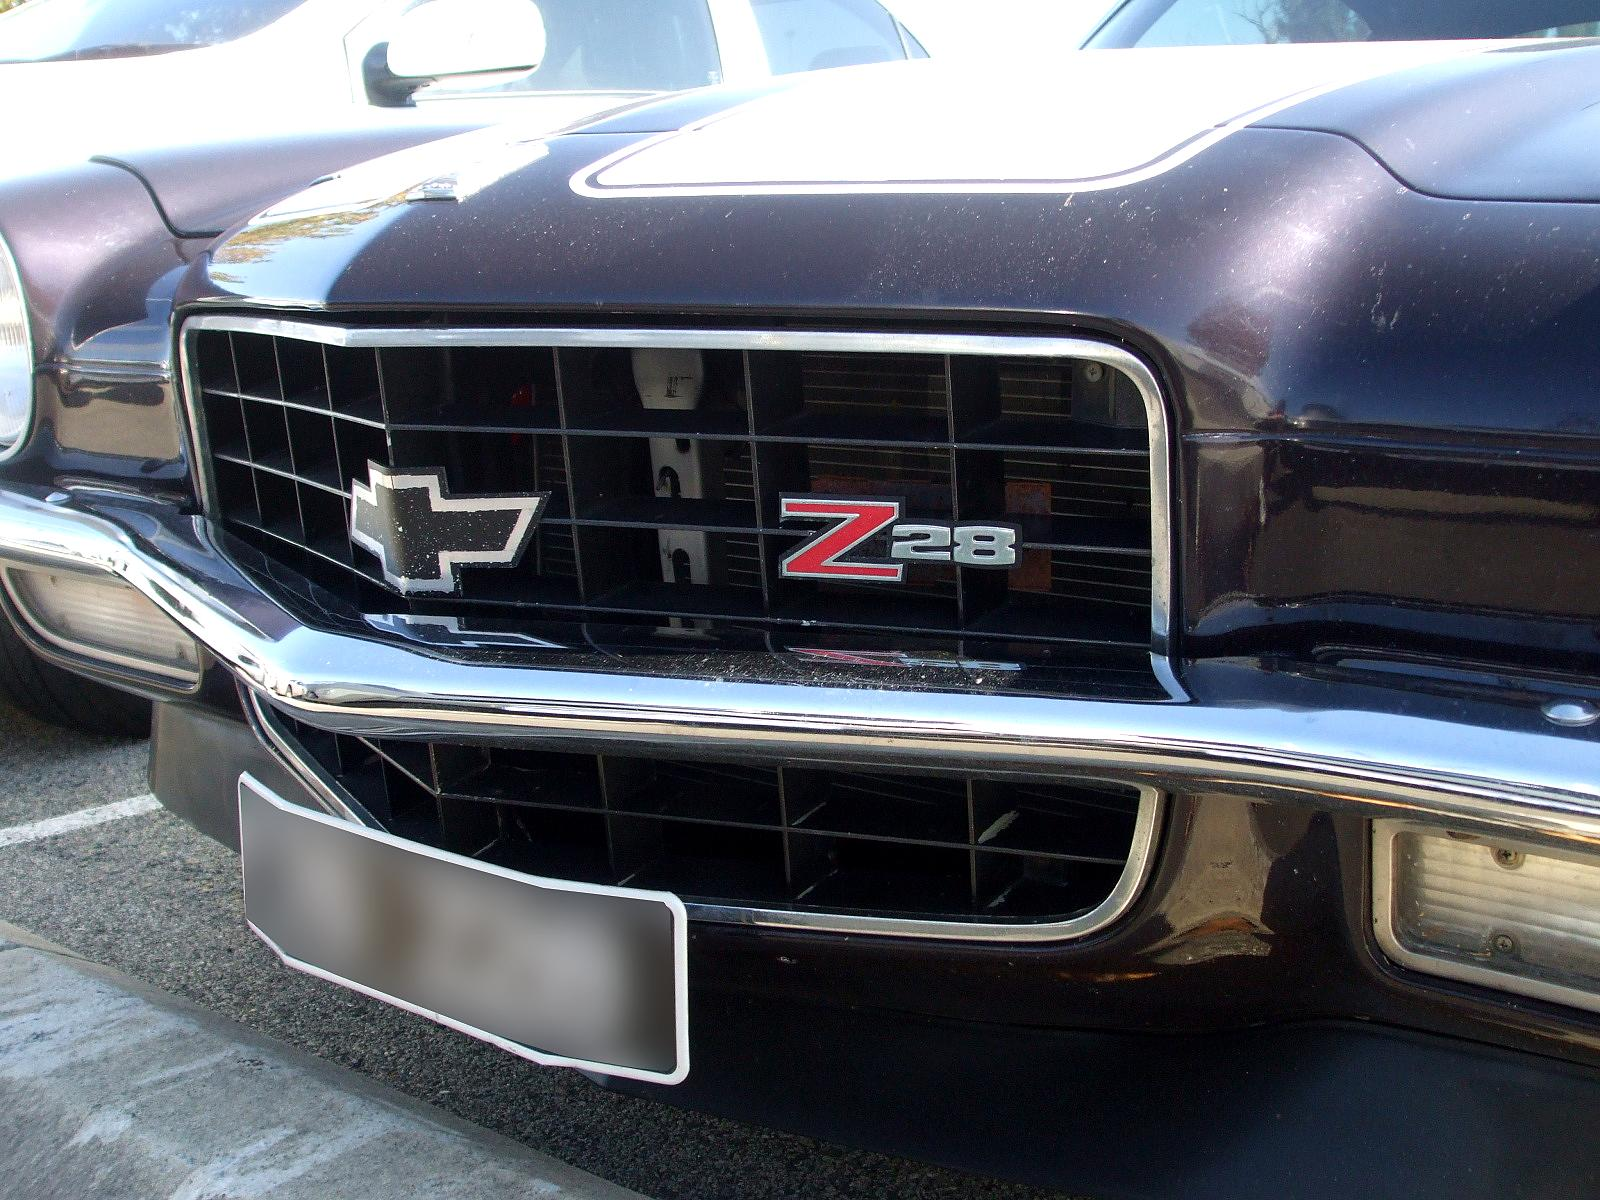 1970 Chevy Camaro Z/28